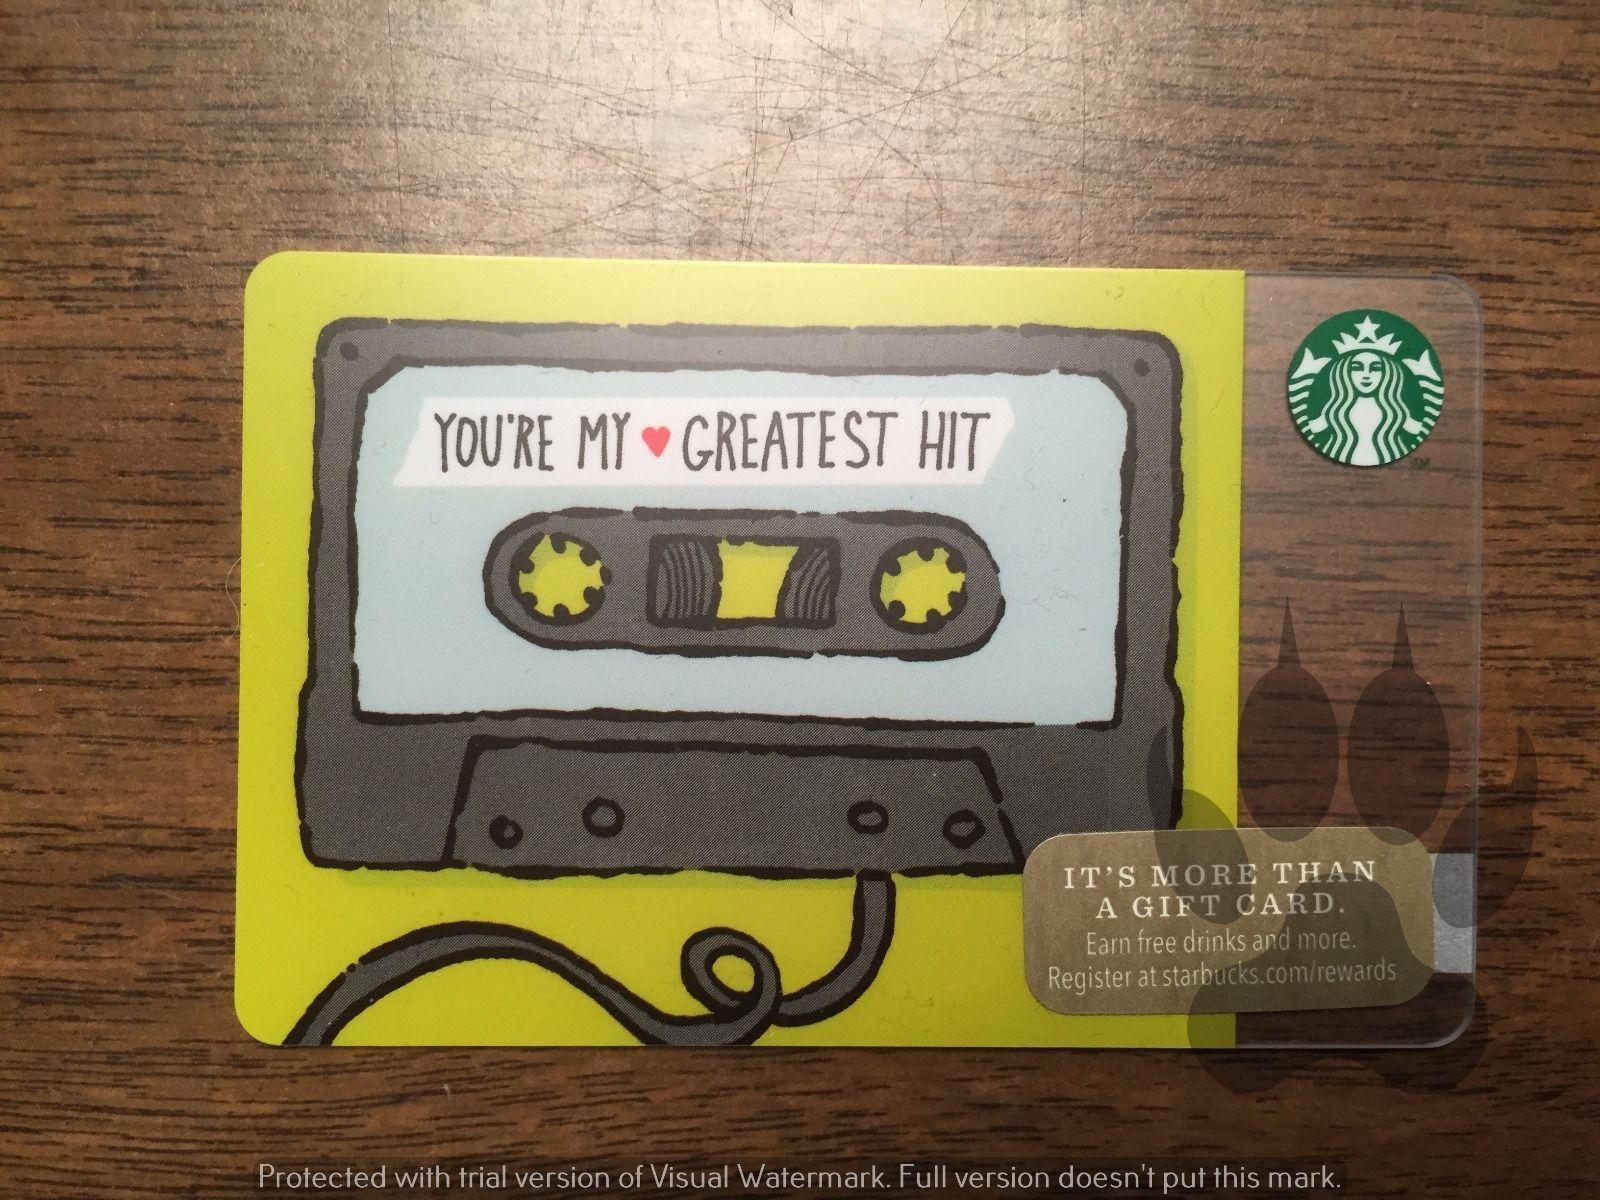 Starbucks gift card 2014 youre my greatest hit cassette